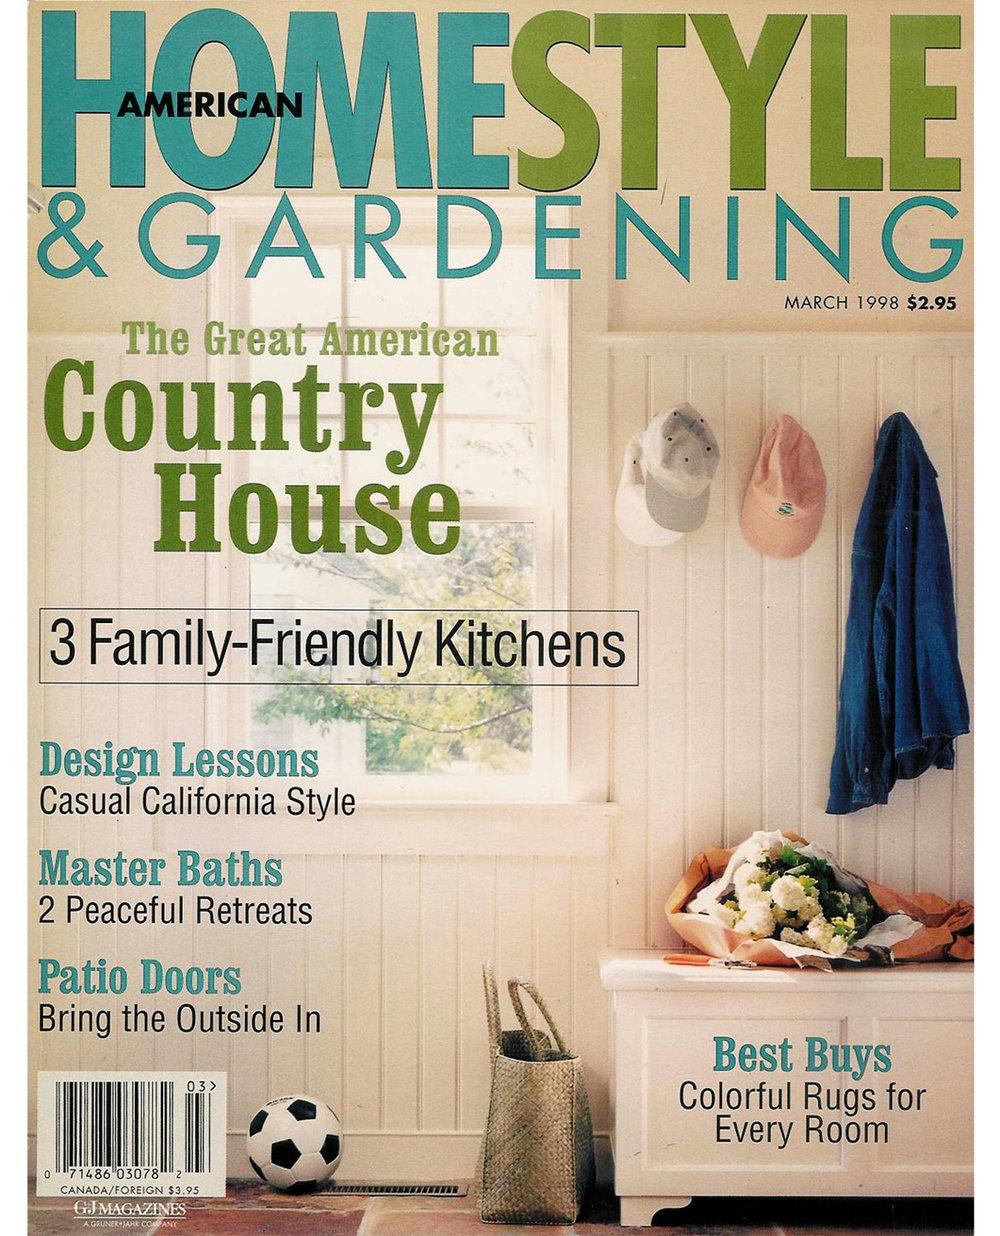 american-homestyle-gardening-cover_alemanmoore.jpg